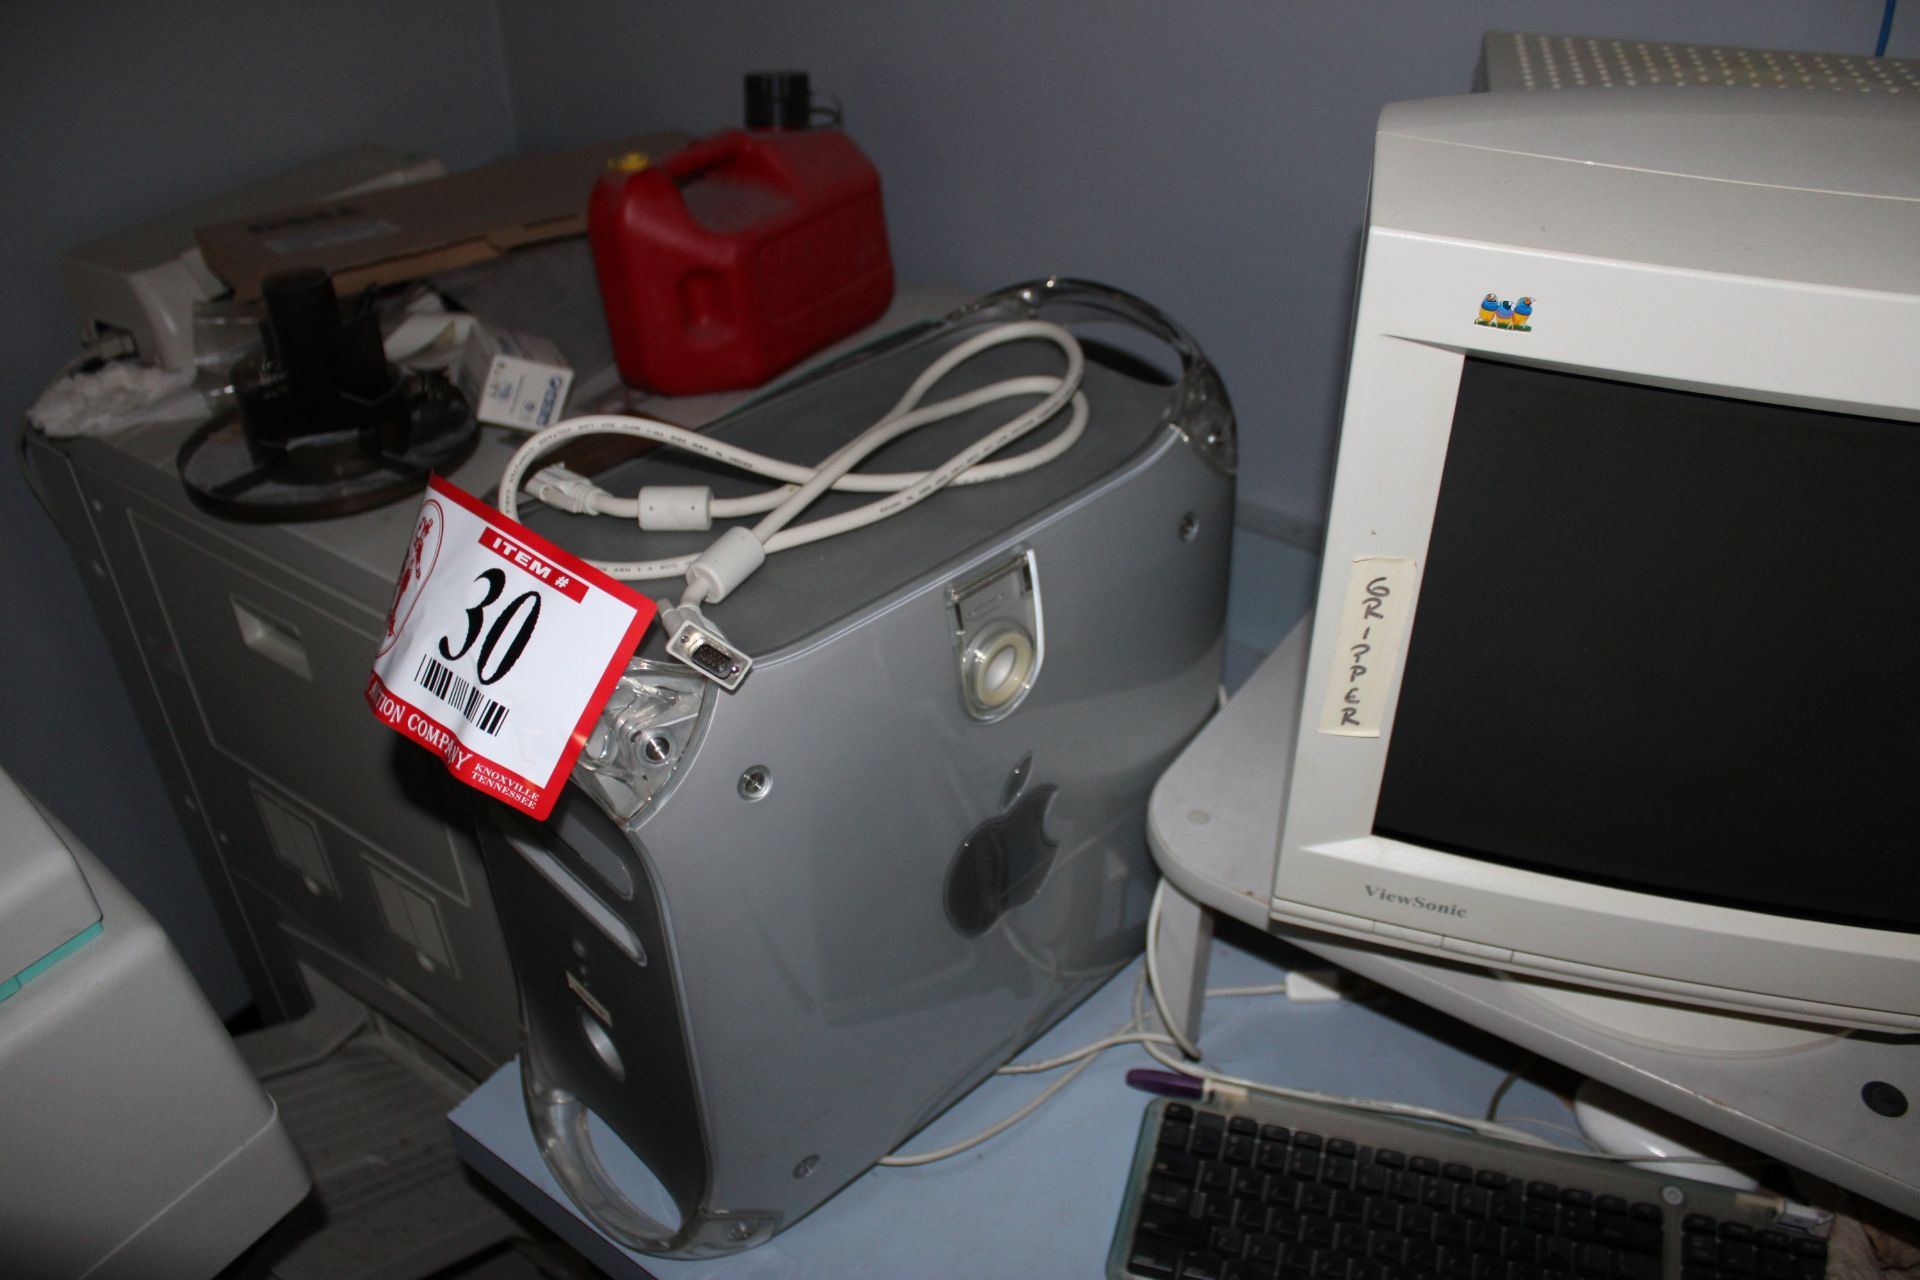 Lot 30 - Power Mac G4 Computer/Keyboard/Monitor